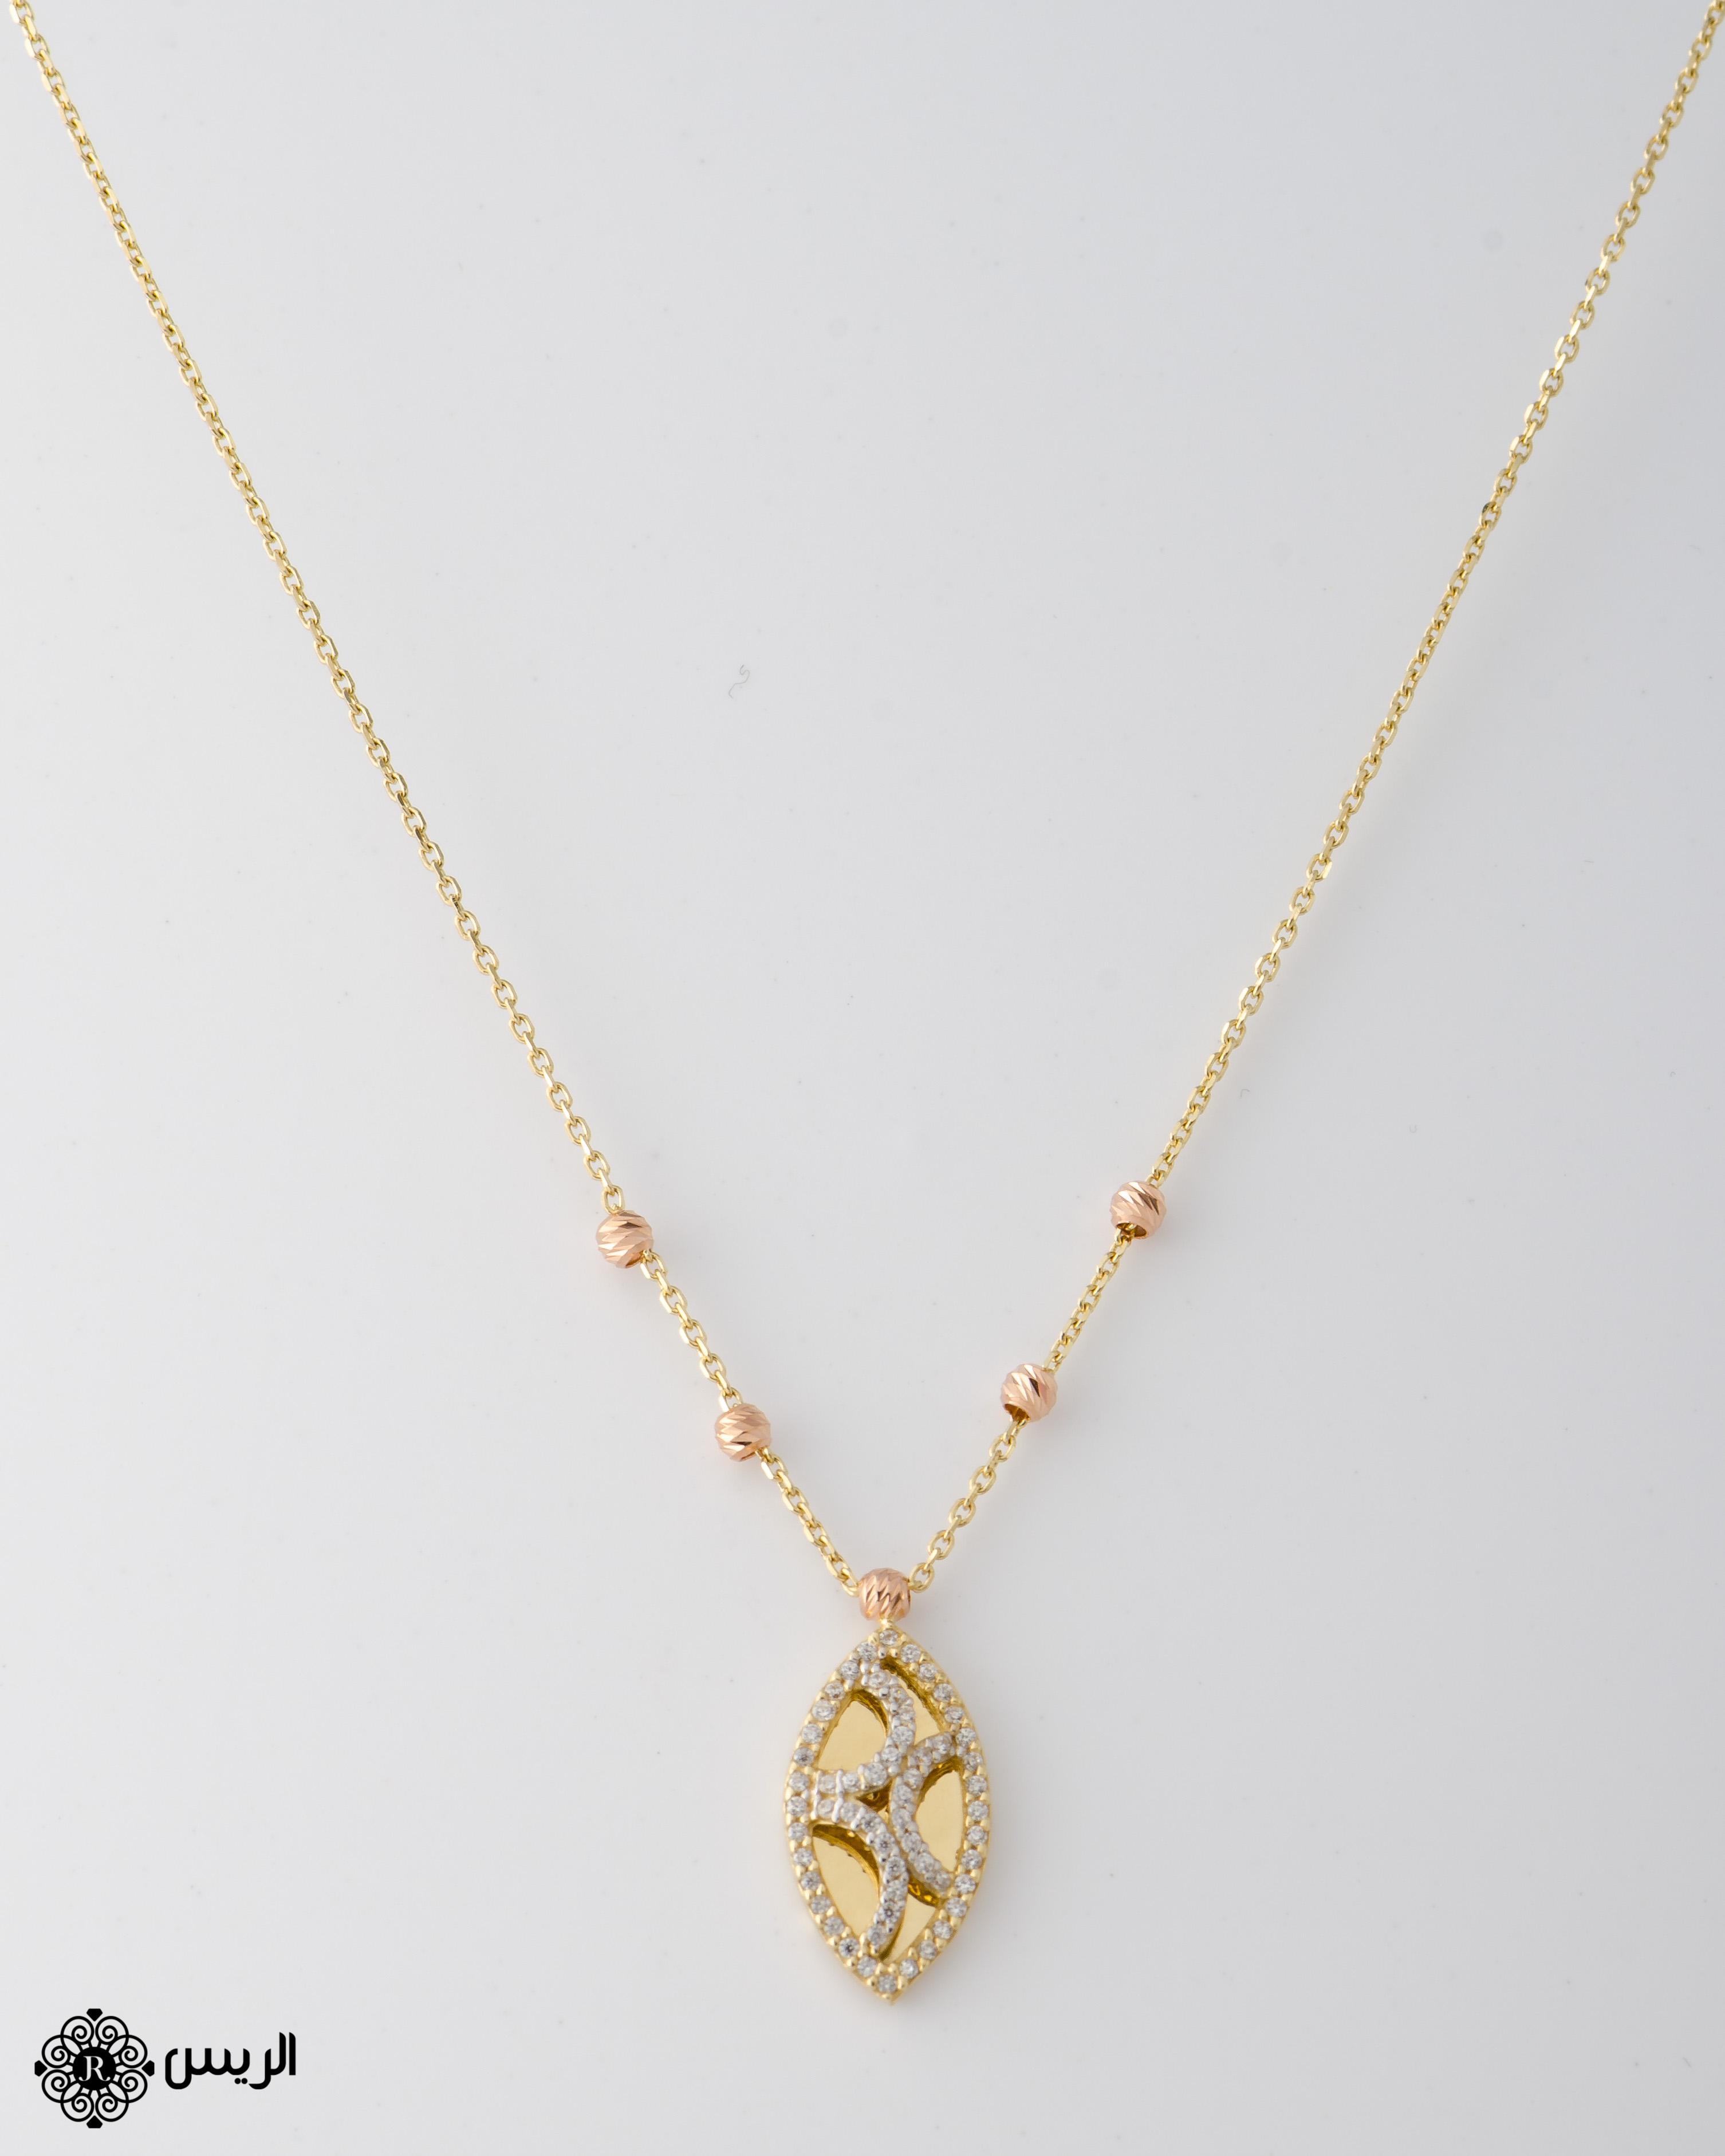 Raies jewelry Pendant with Chain تعليقة مع سلسله الريس للمجوهرات